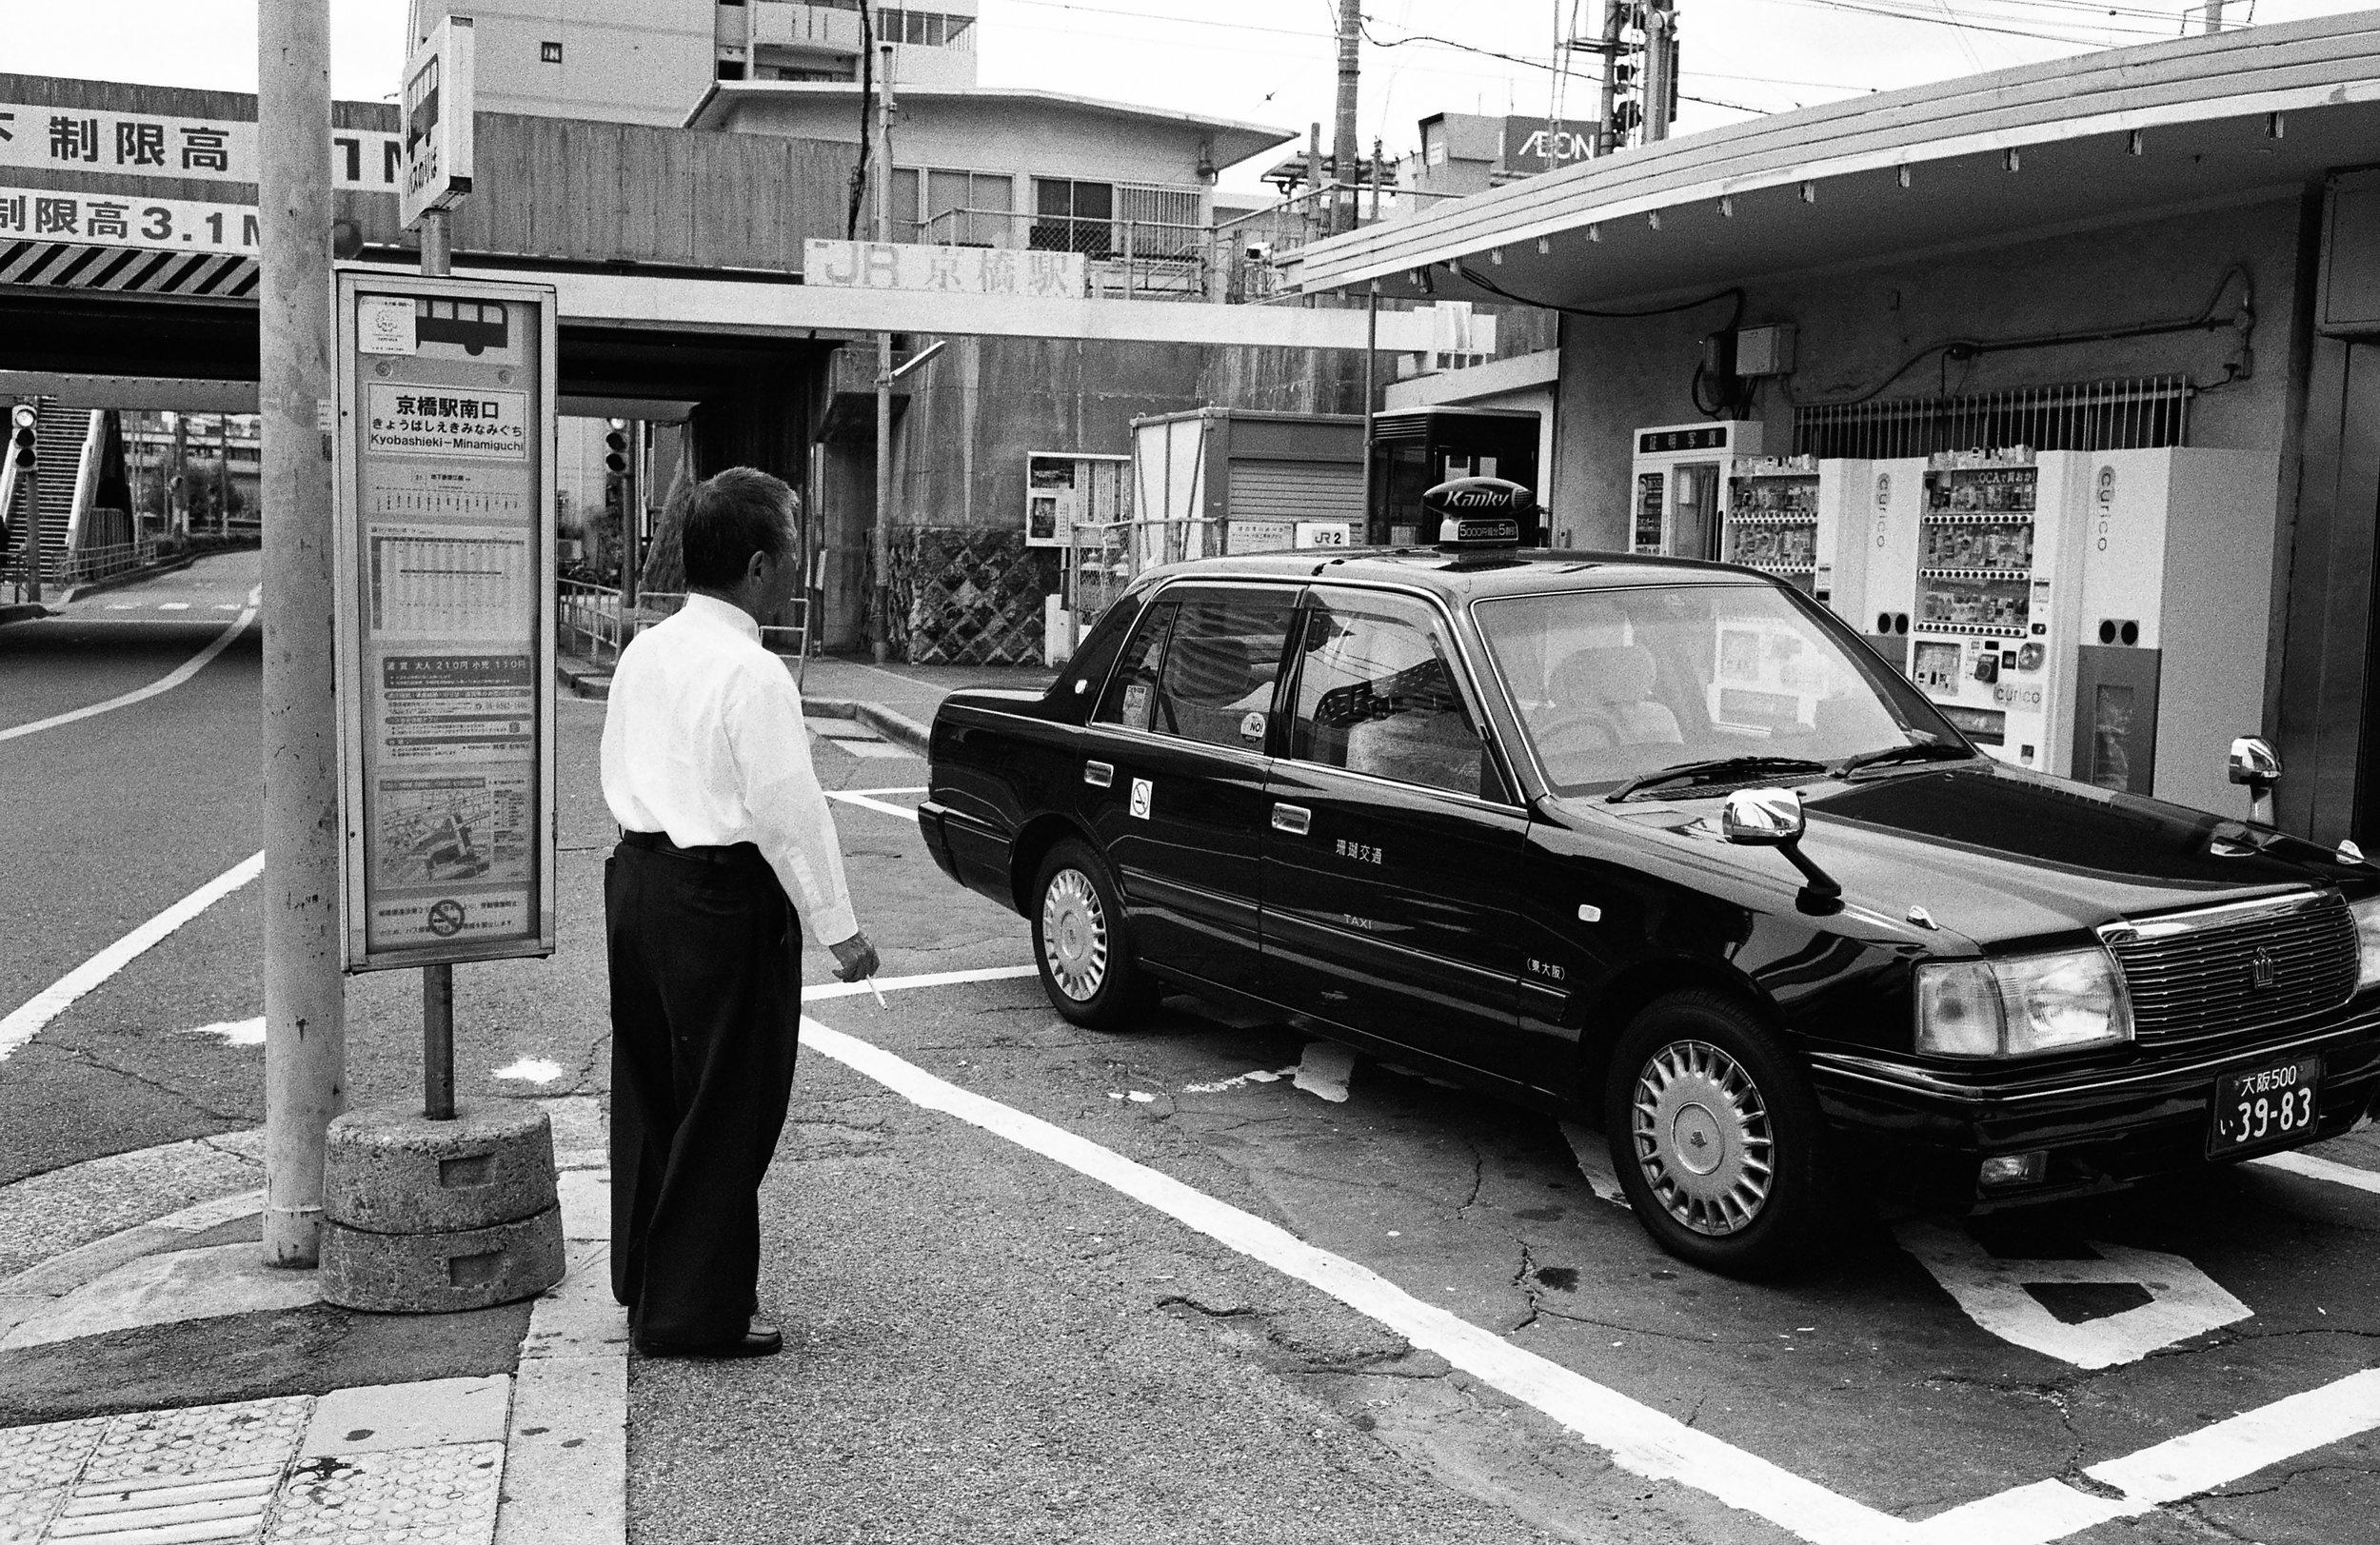 M6-TRIX400-800ISO-JAPANSUM18-OSAKALOOPLINE(Y)-KYOBASHI-020 - Copy.jpg